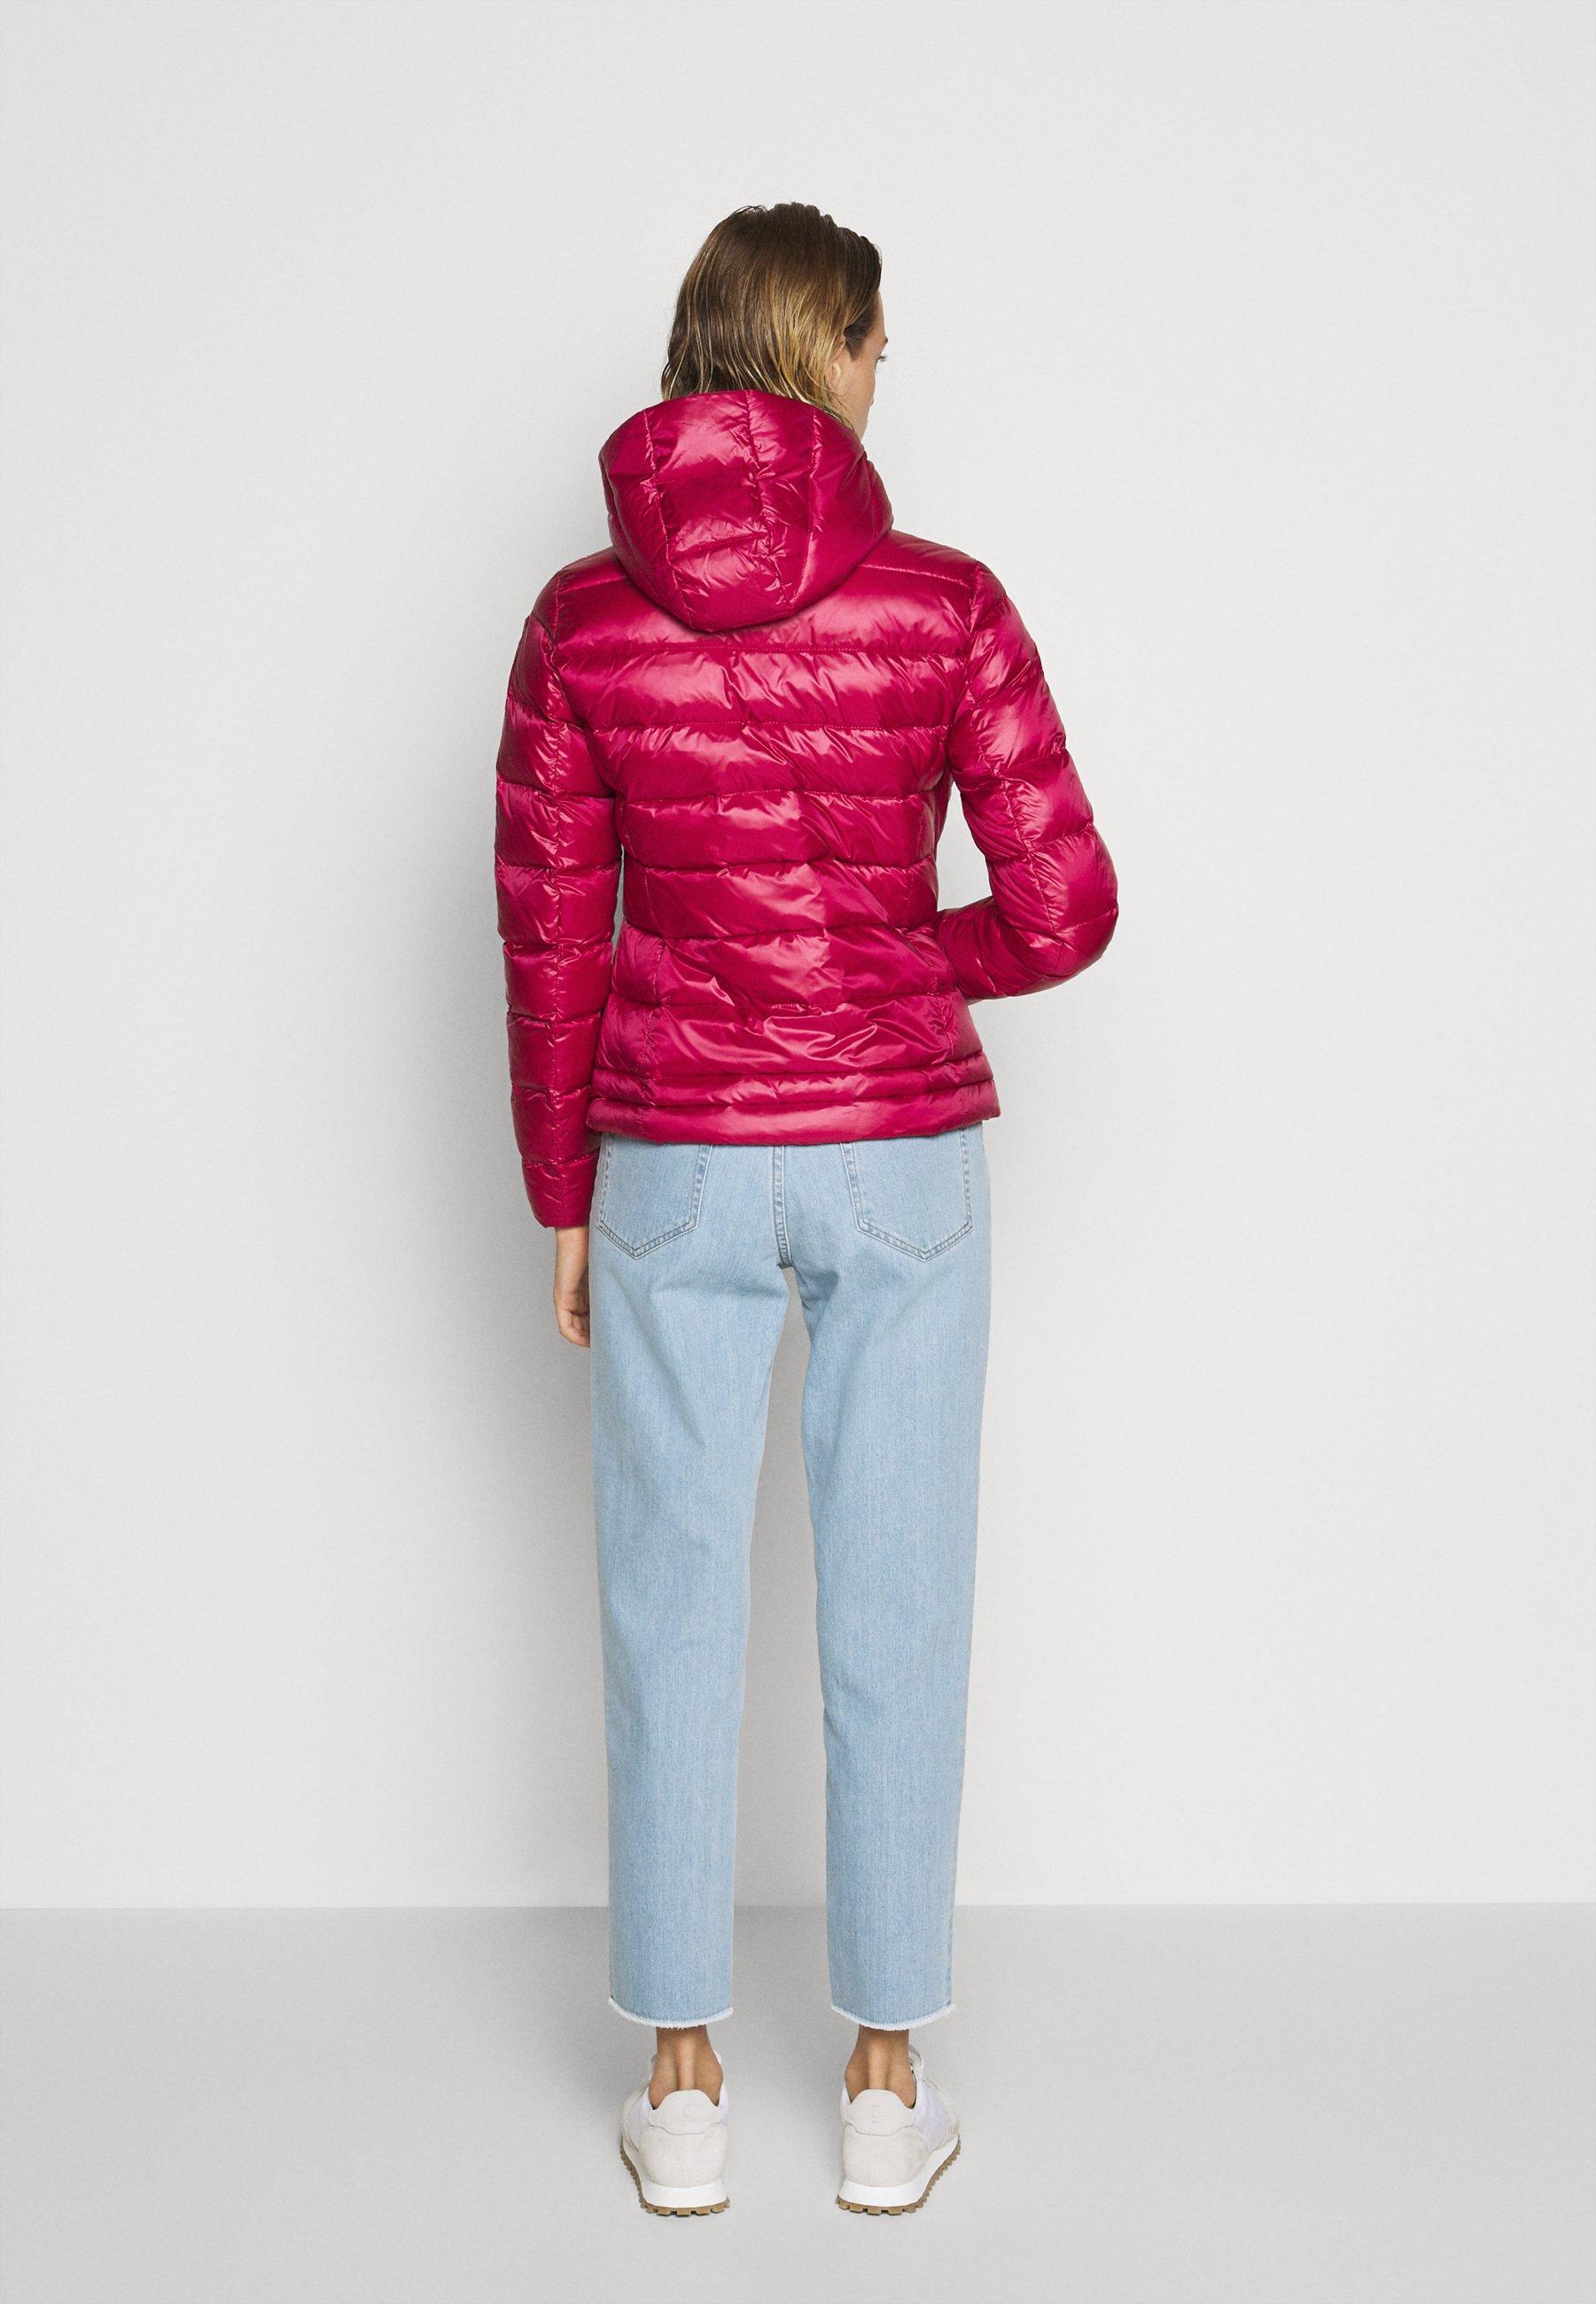 Bulk Designs Women's Clothing Blauer GIUBBINI CORTI IMBOTTITO PIUMA Down jacket raspberry 8cNAdWaT9